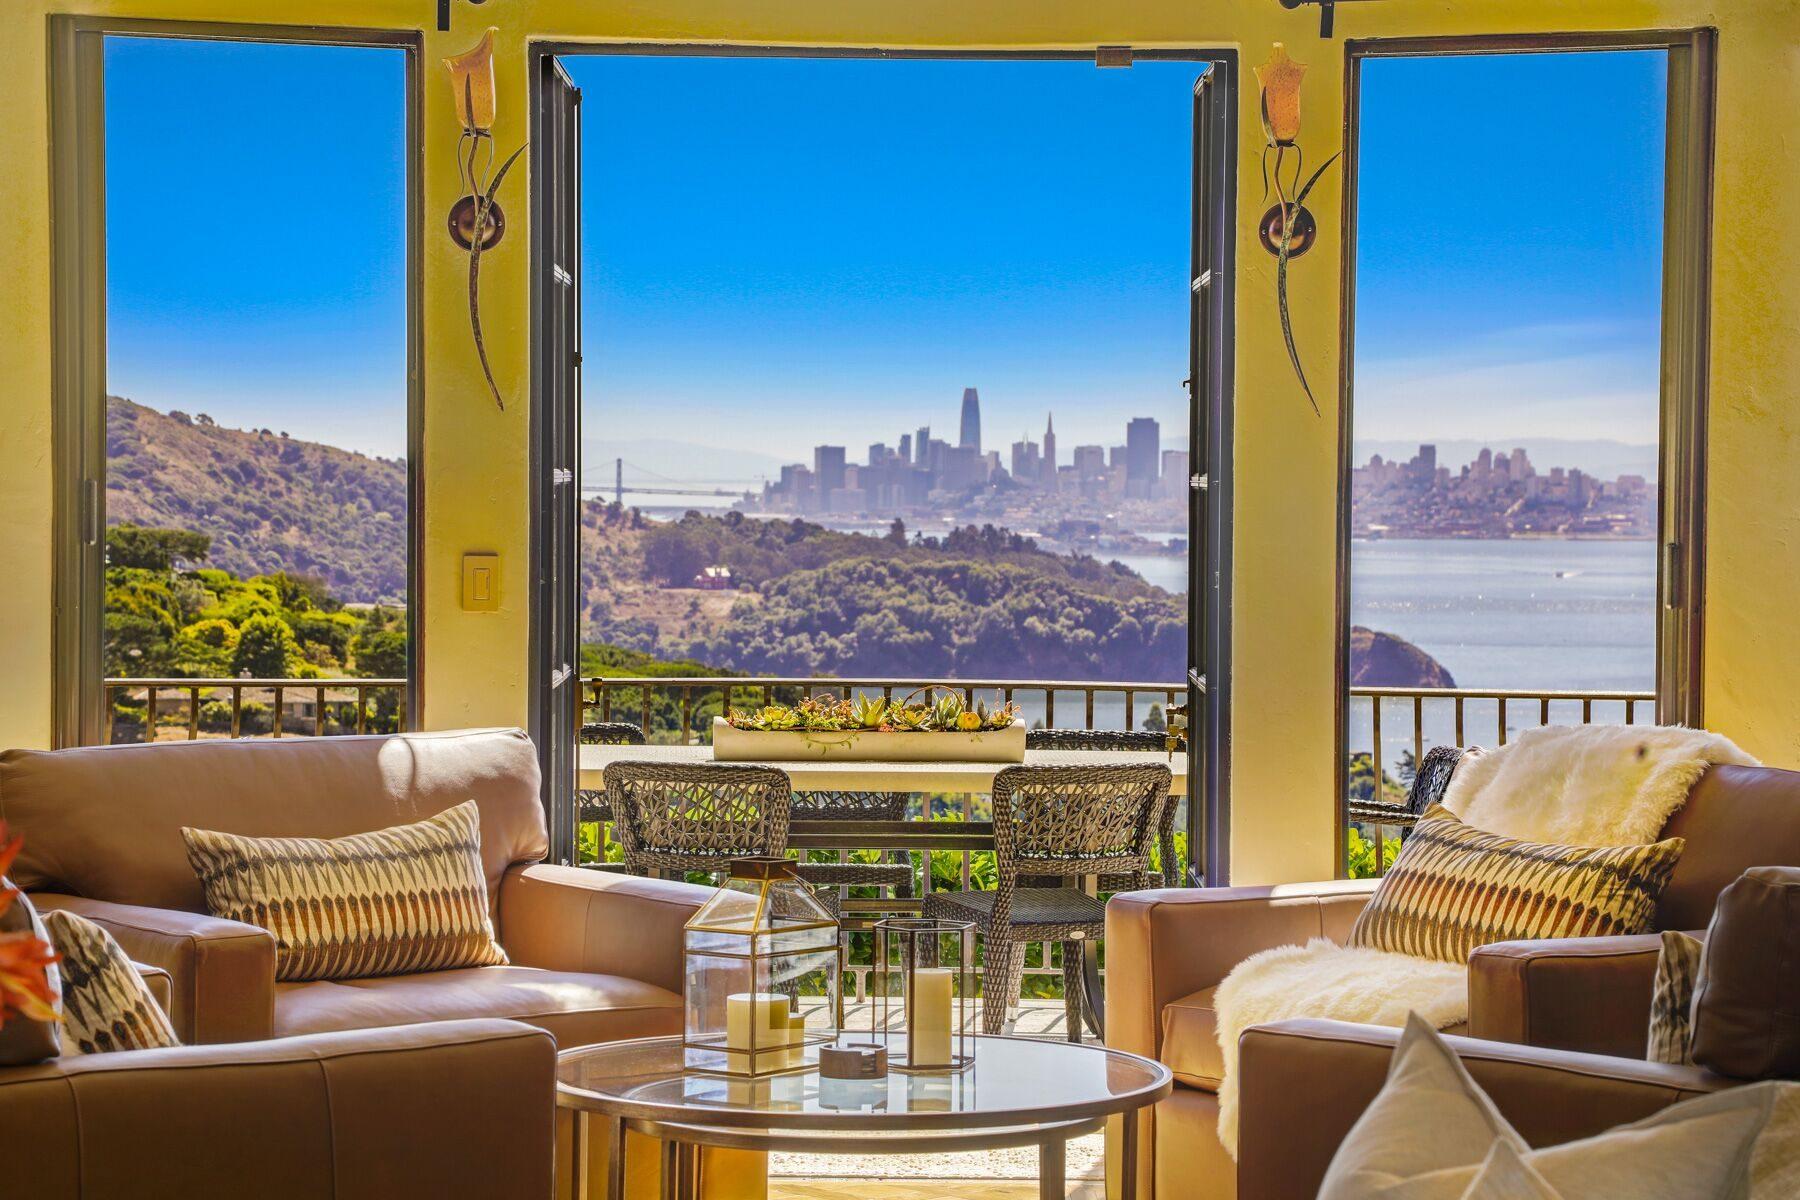 window view of San Francisco